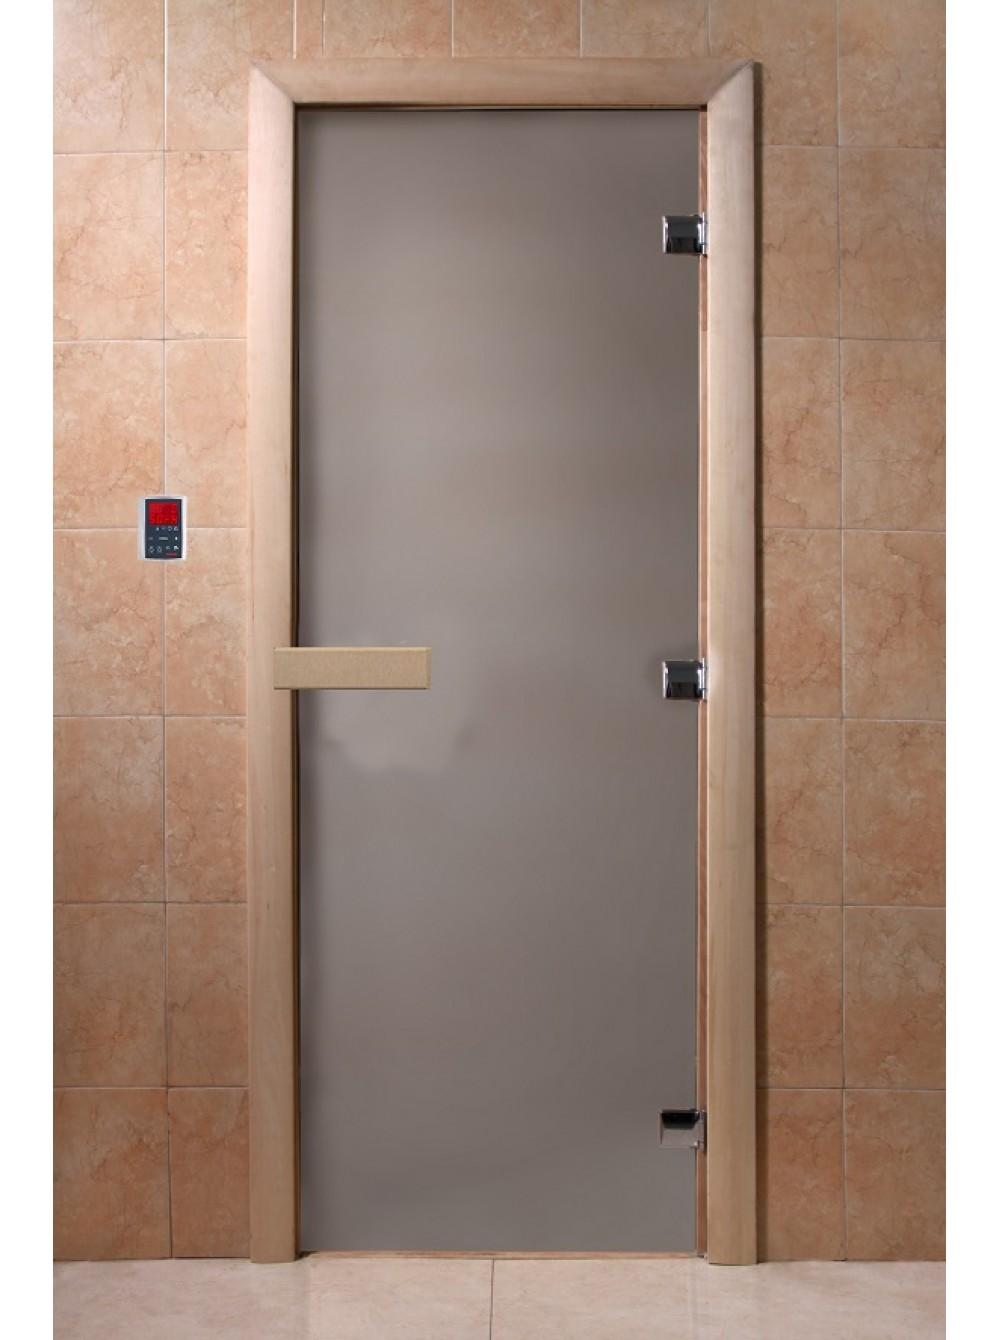 Дверь банная стекло DoorWood сатин 1900х700х8мм (Теплое утро)